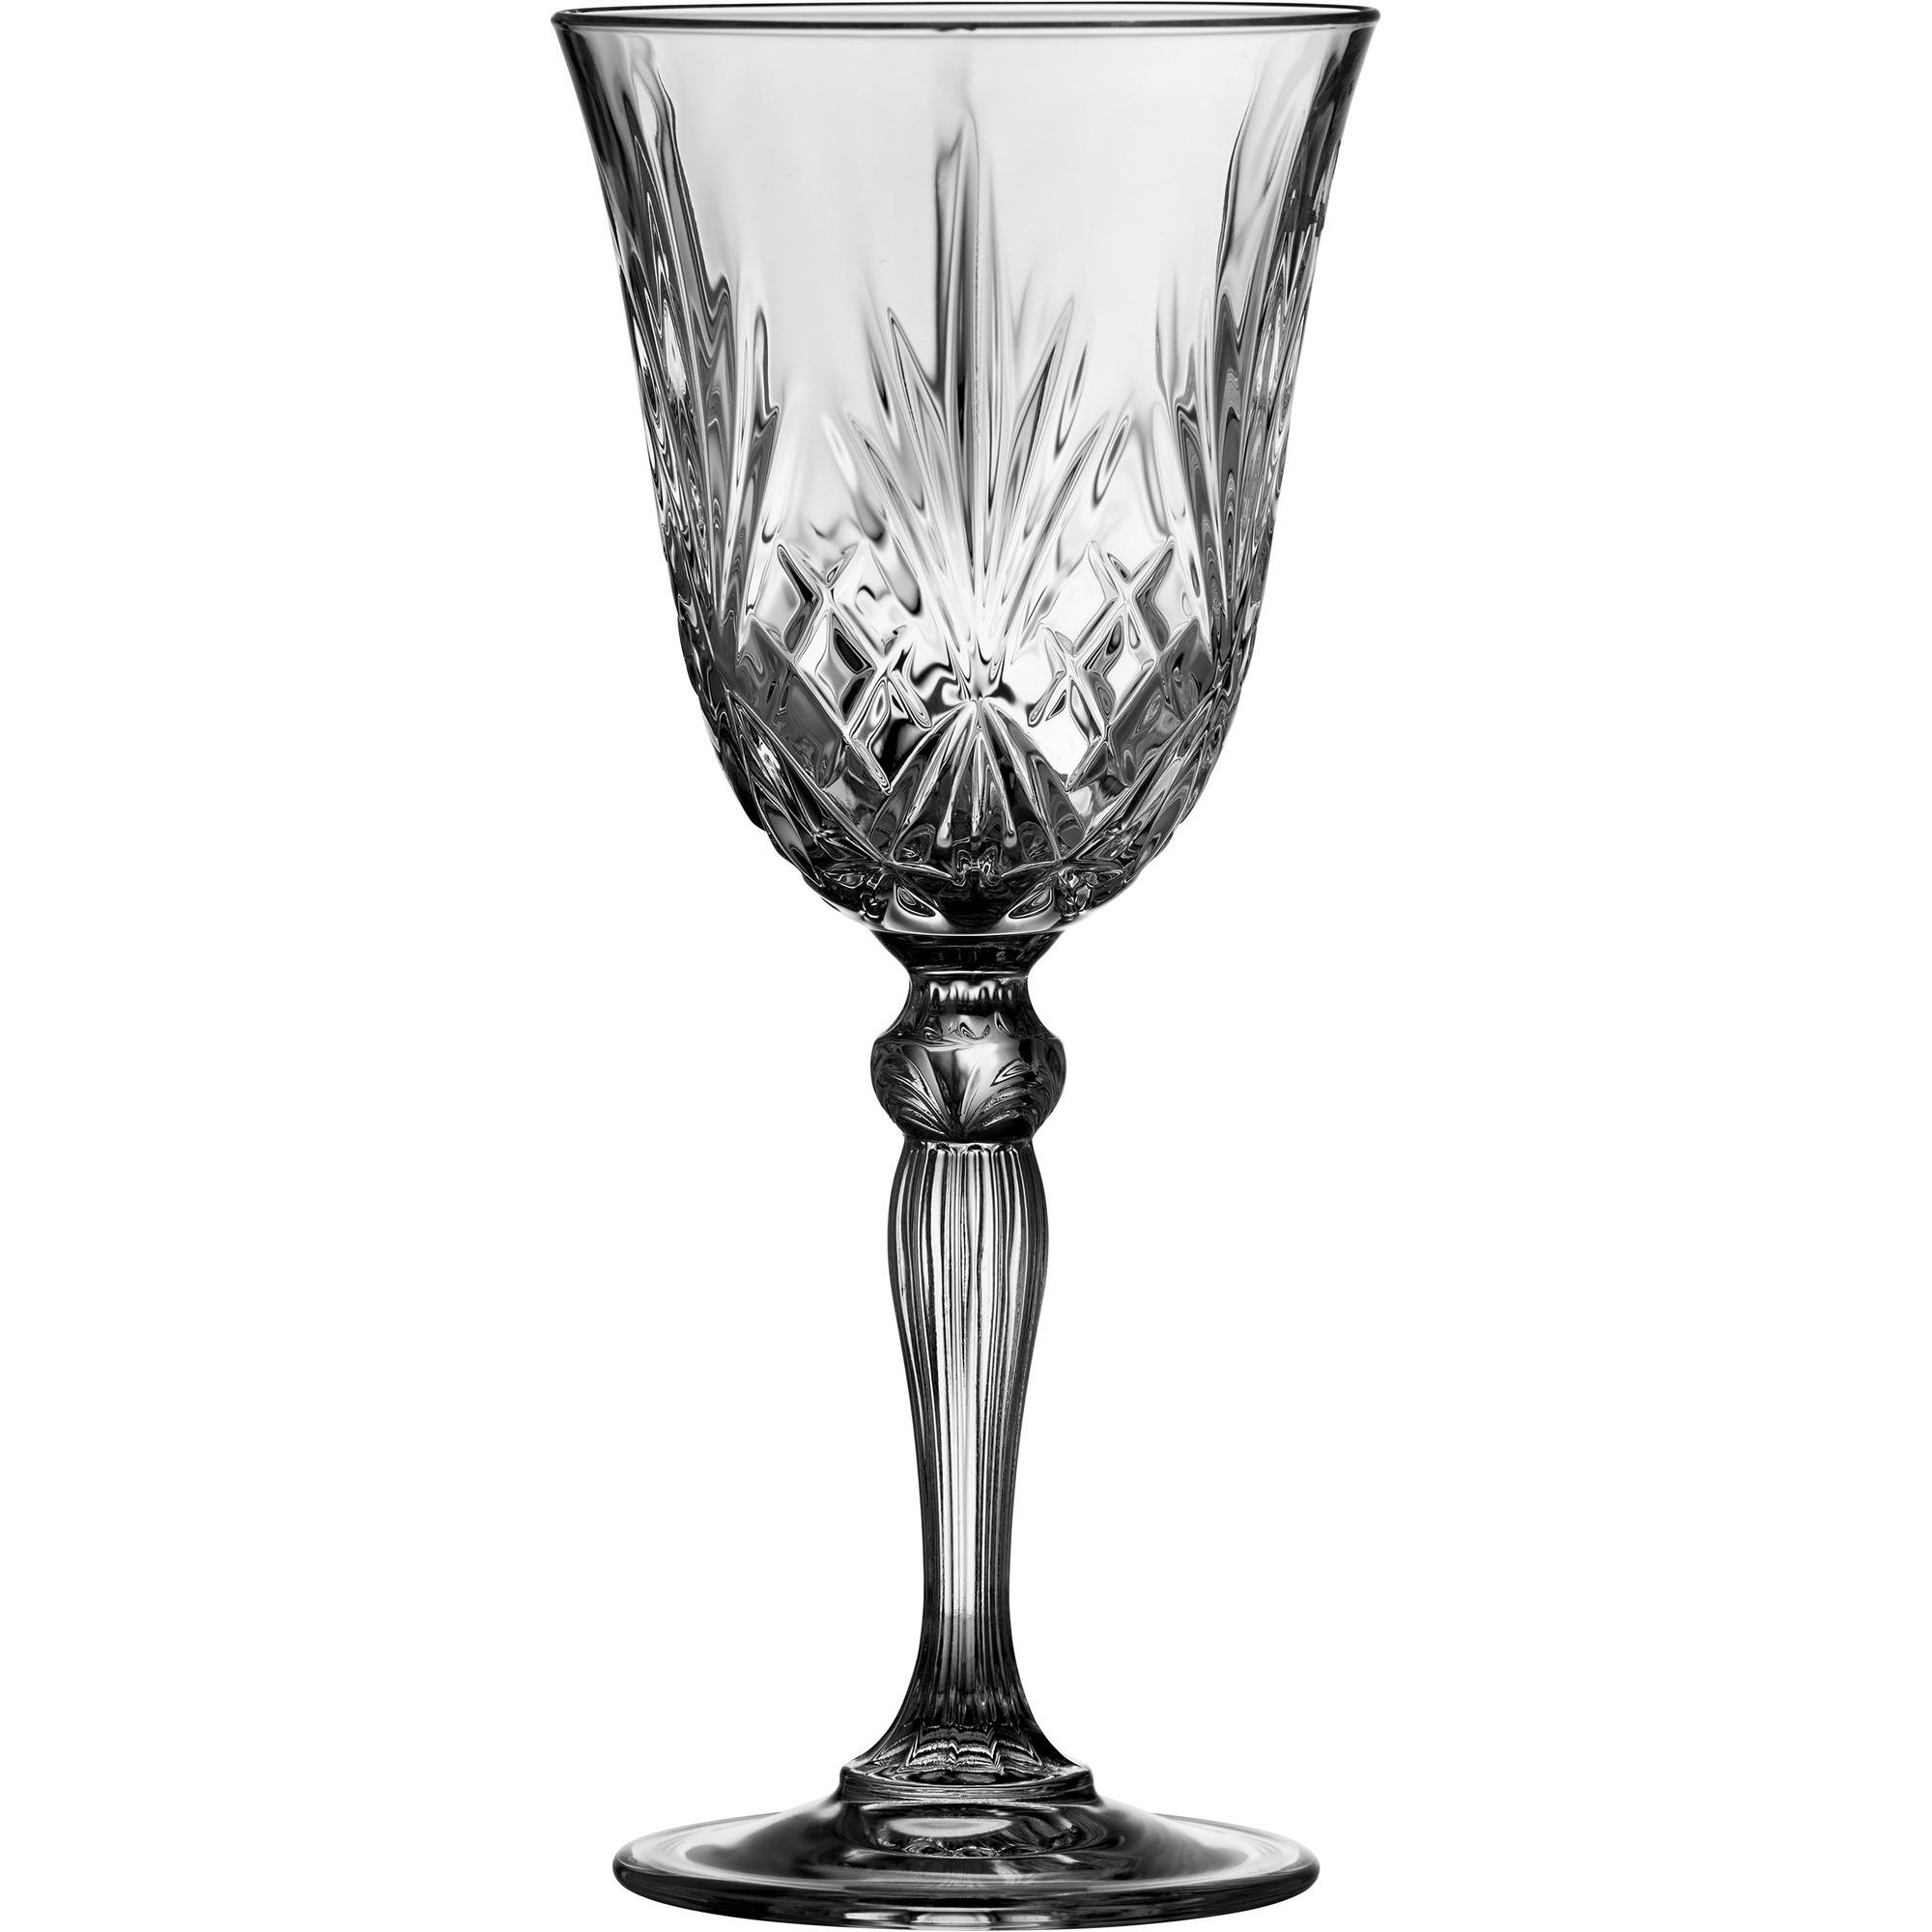 Lyngby Melodia Rödvinsglas 4 stk.